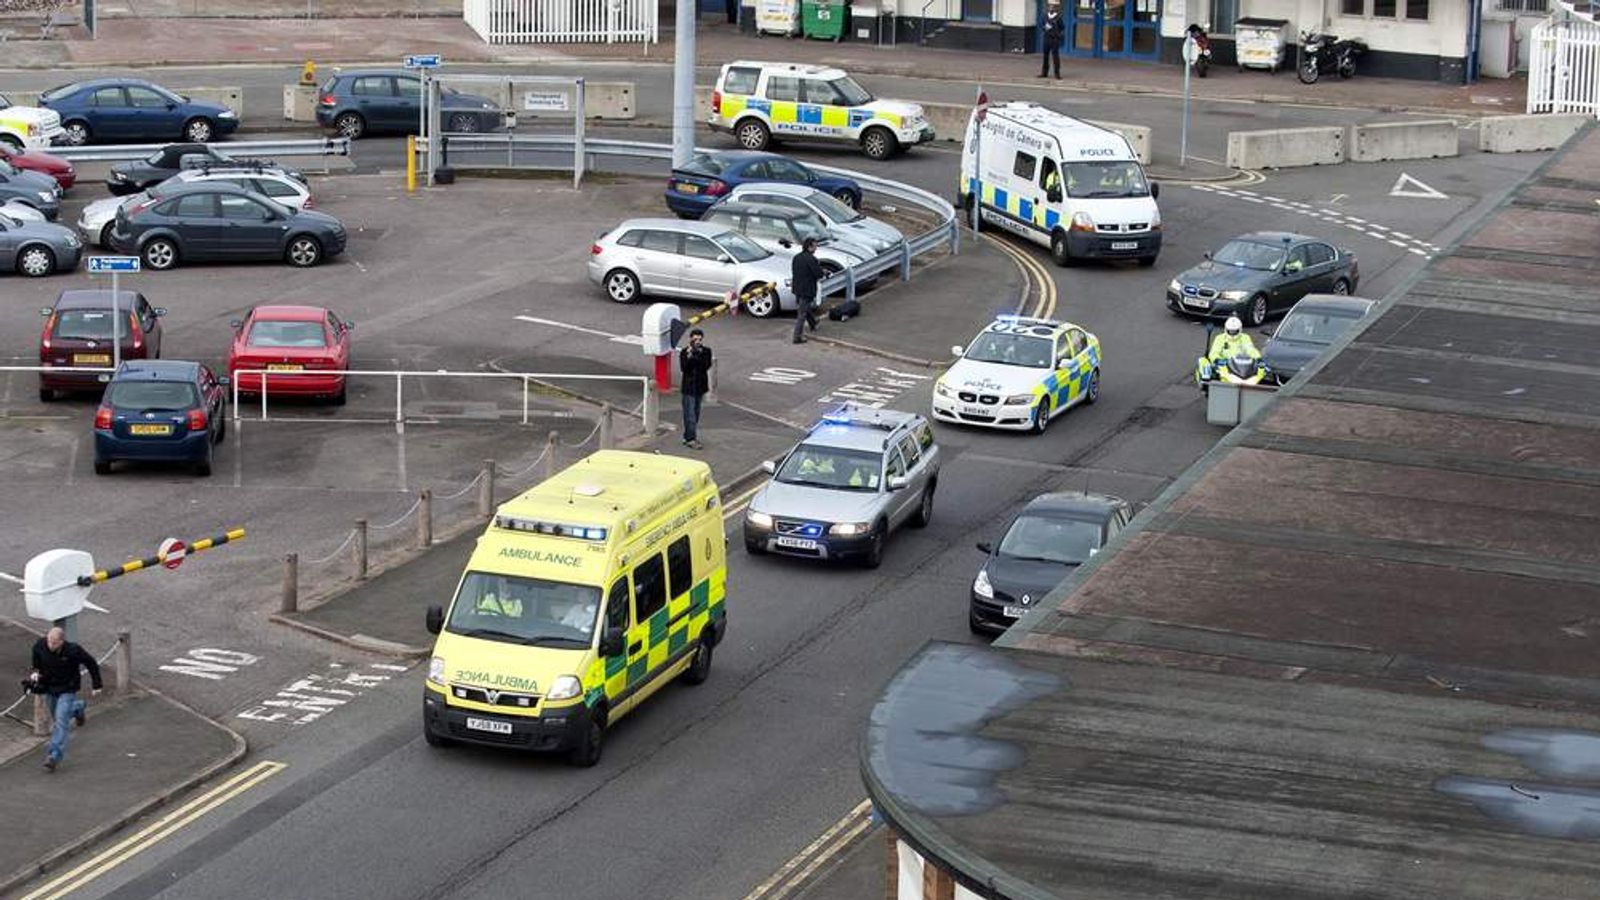 Malala arrives at hospital